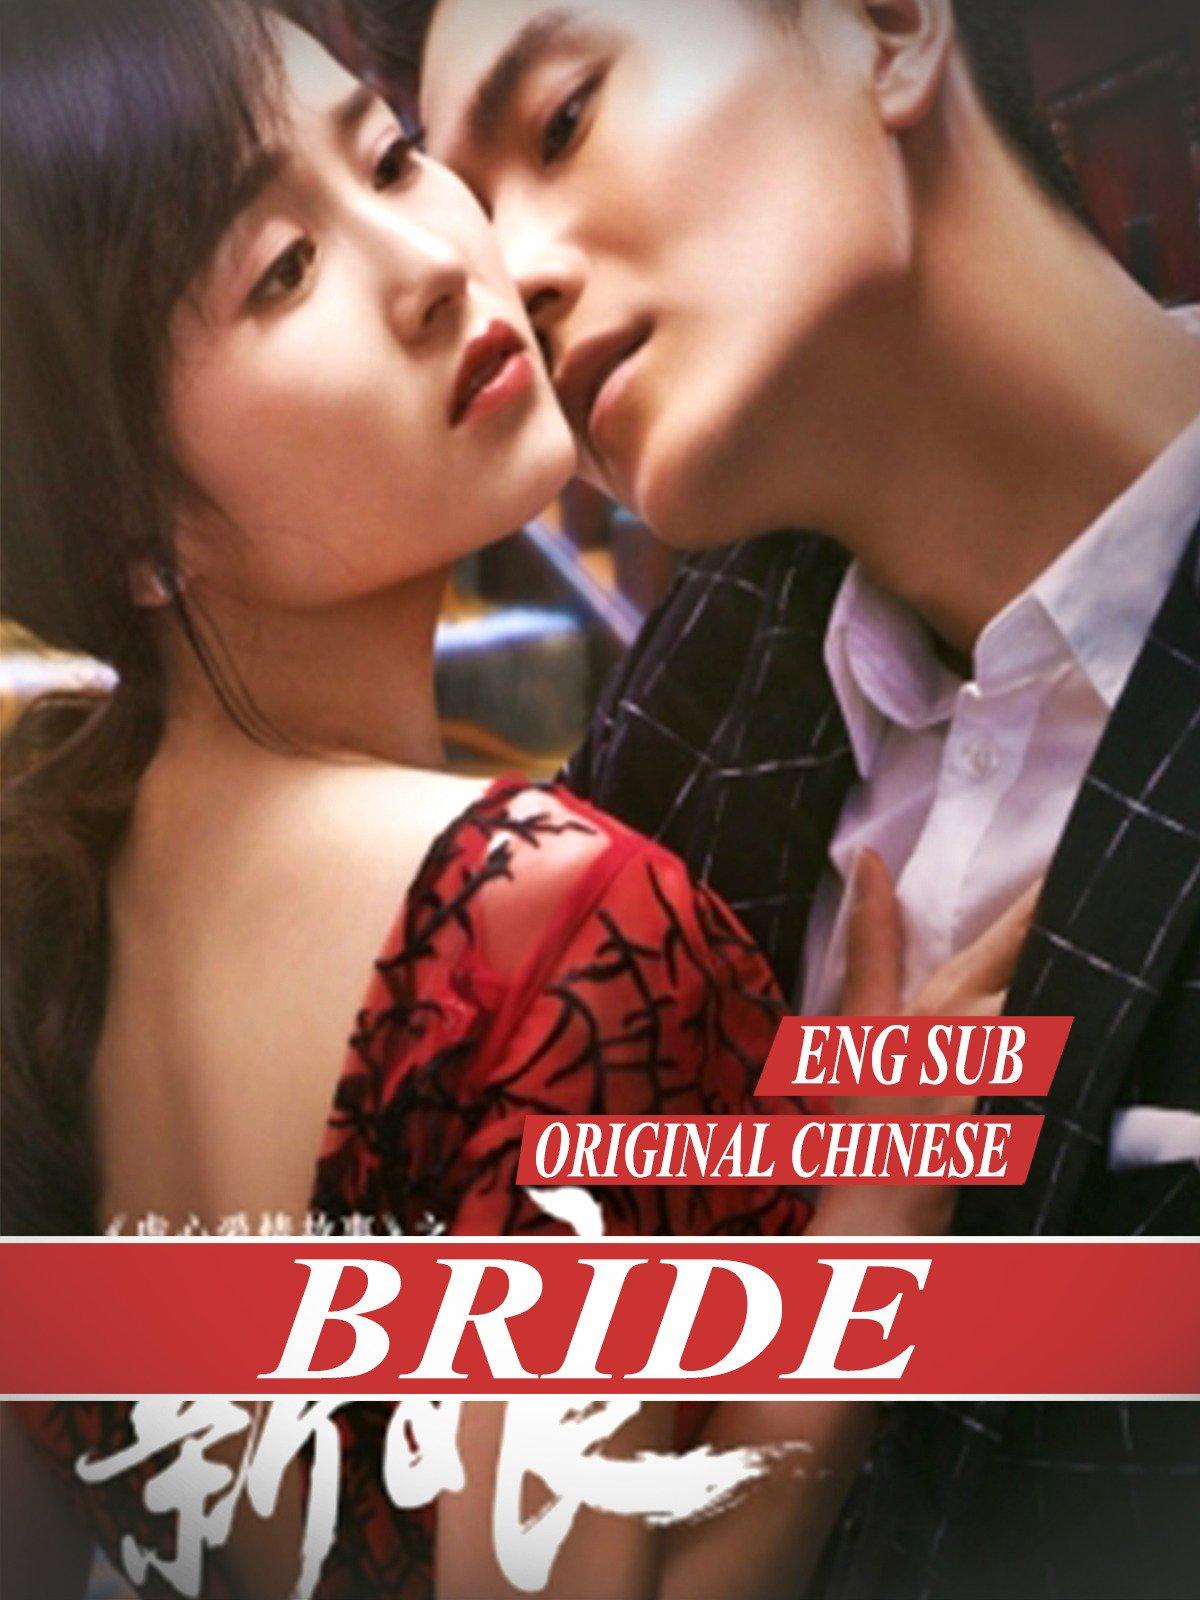 Bride [Eng Sub] original Chinese